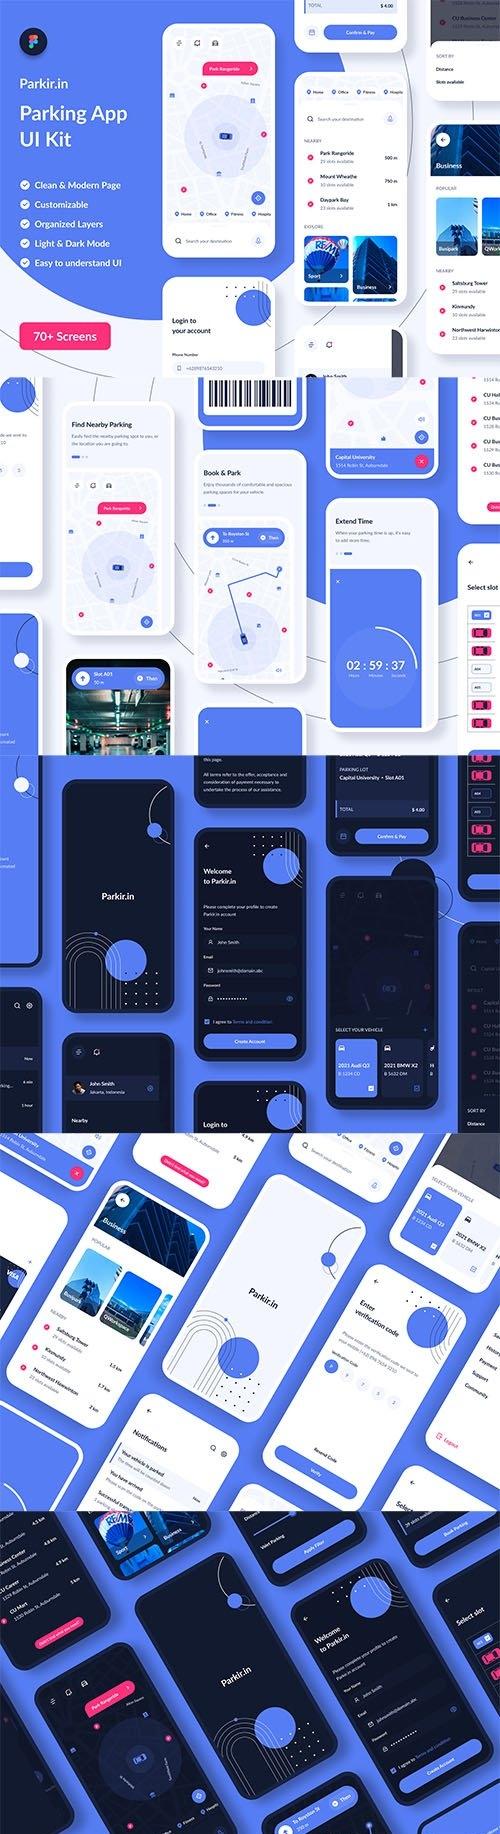 Parkirin : Parking App UI Kit